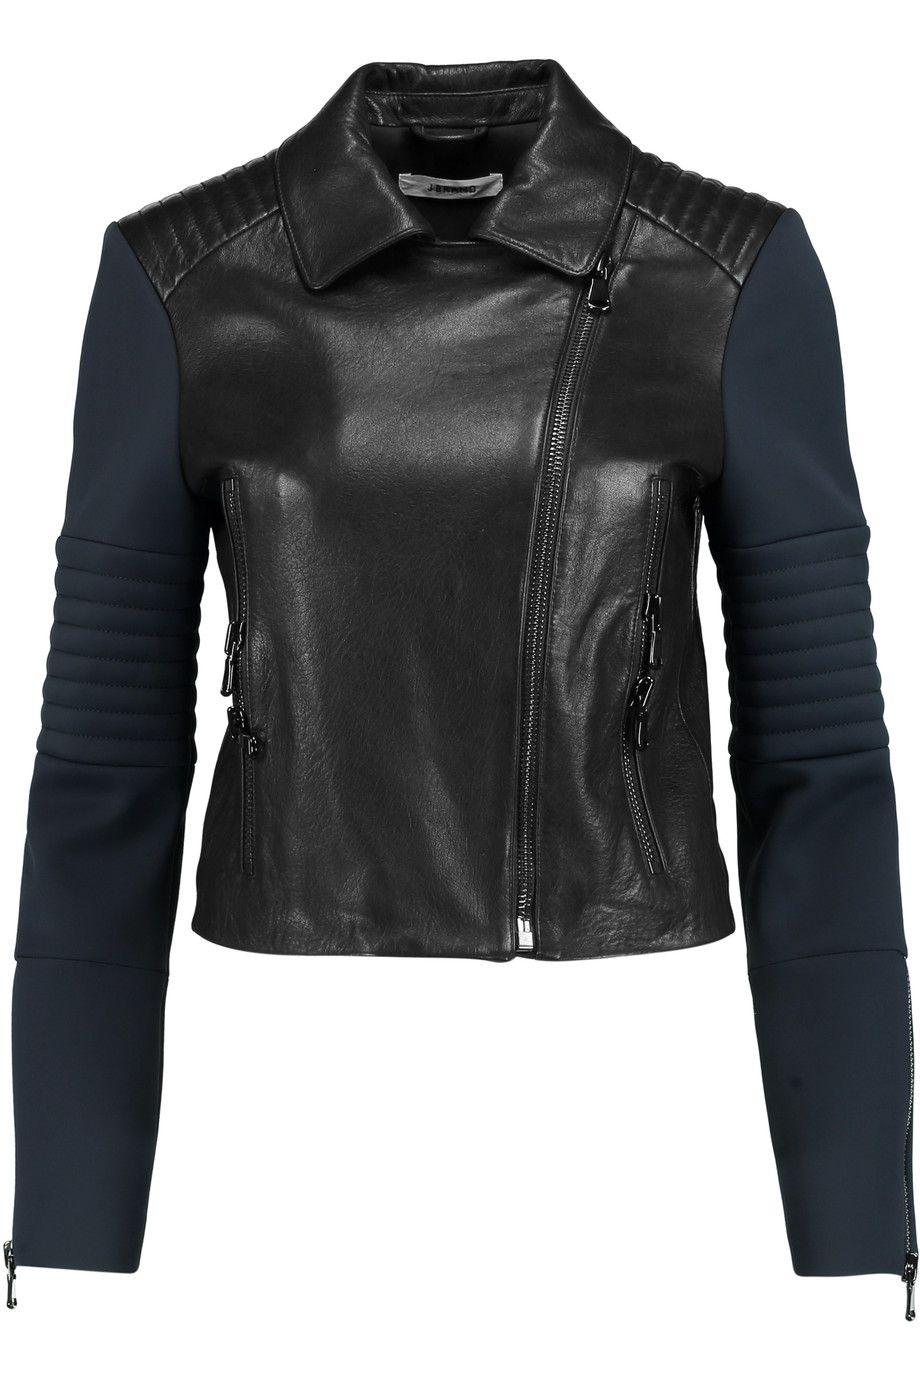 Aiah Neoprenepaneled Leather Biker Jacket Leather